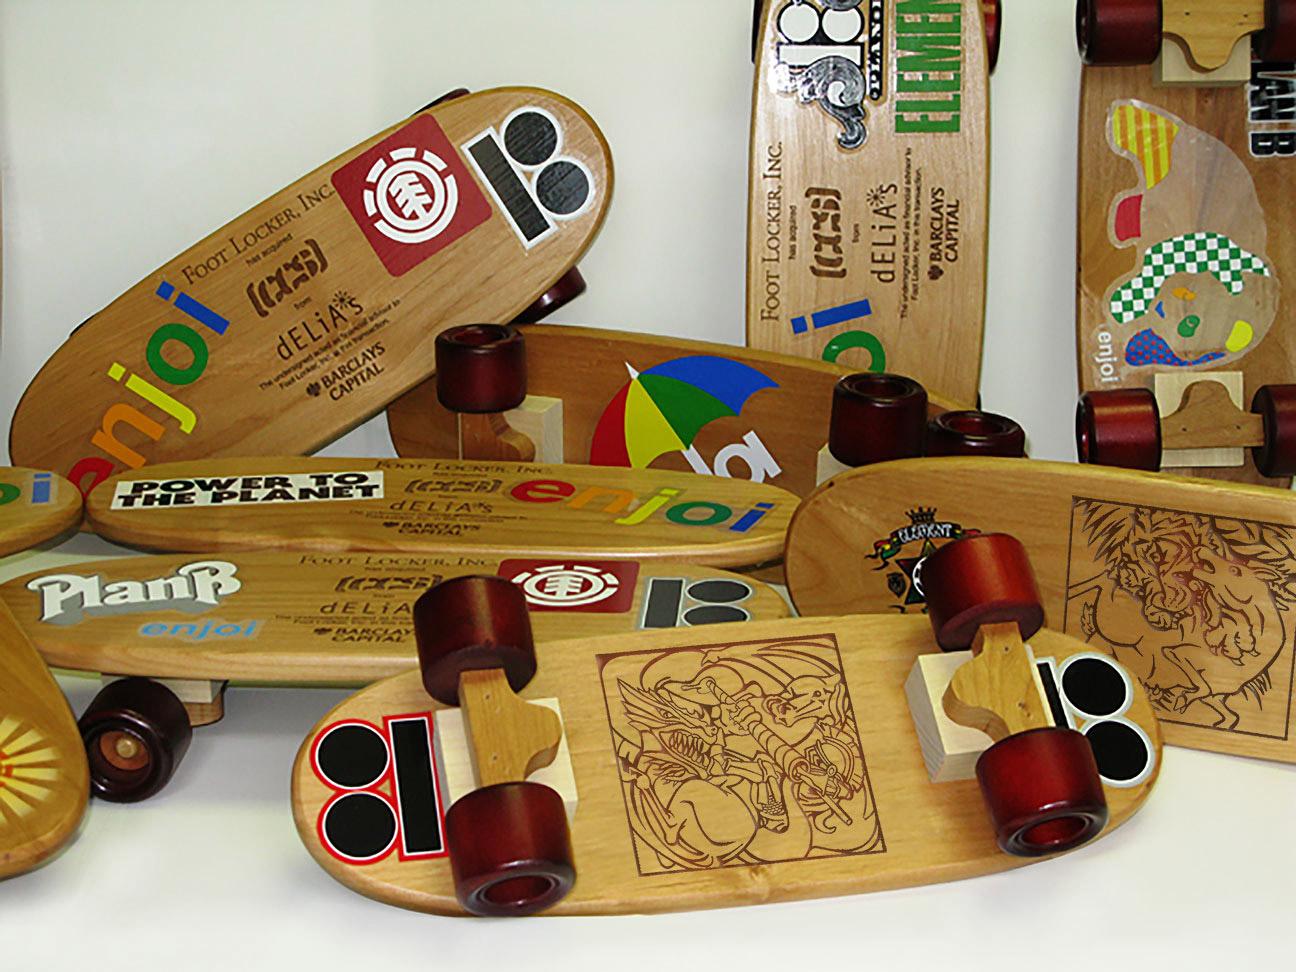 tgp-footlocker-skateboard -Sean Geyer - Design - Art Director